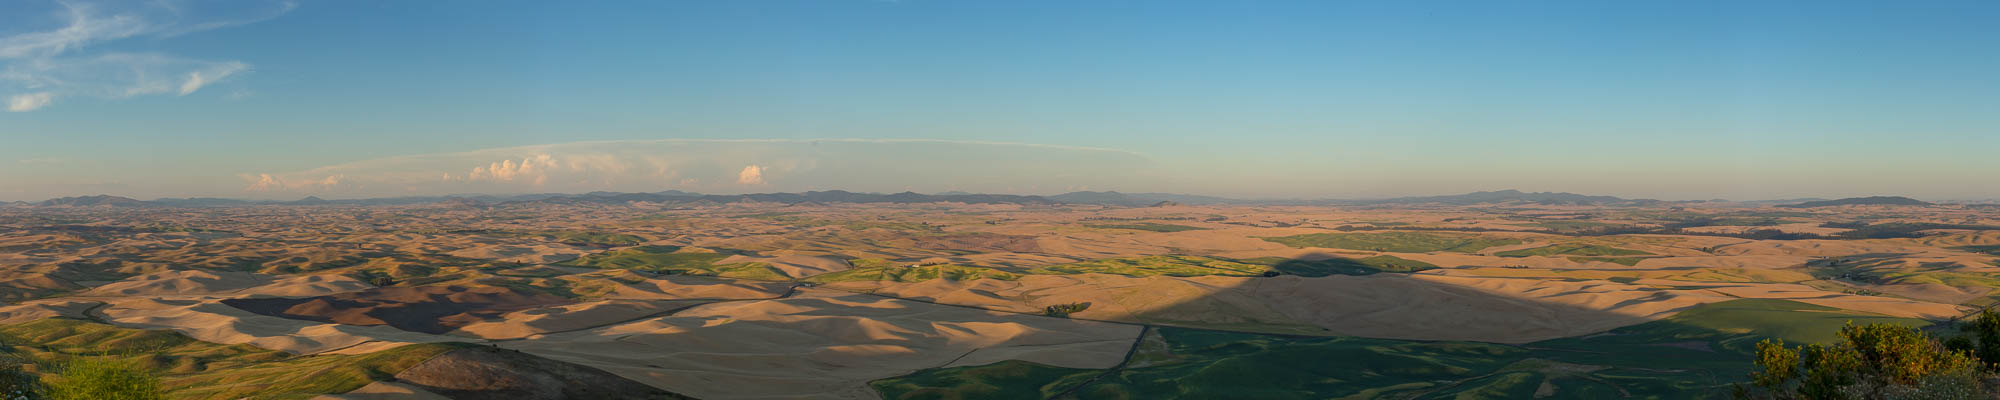 Panorama from Steptoe Butte, Whitman, WA